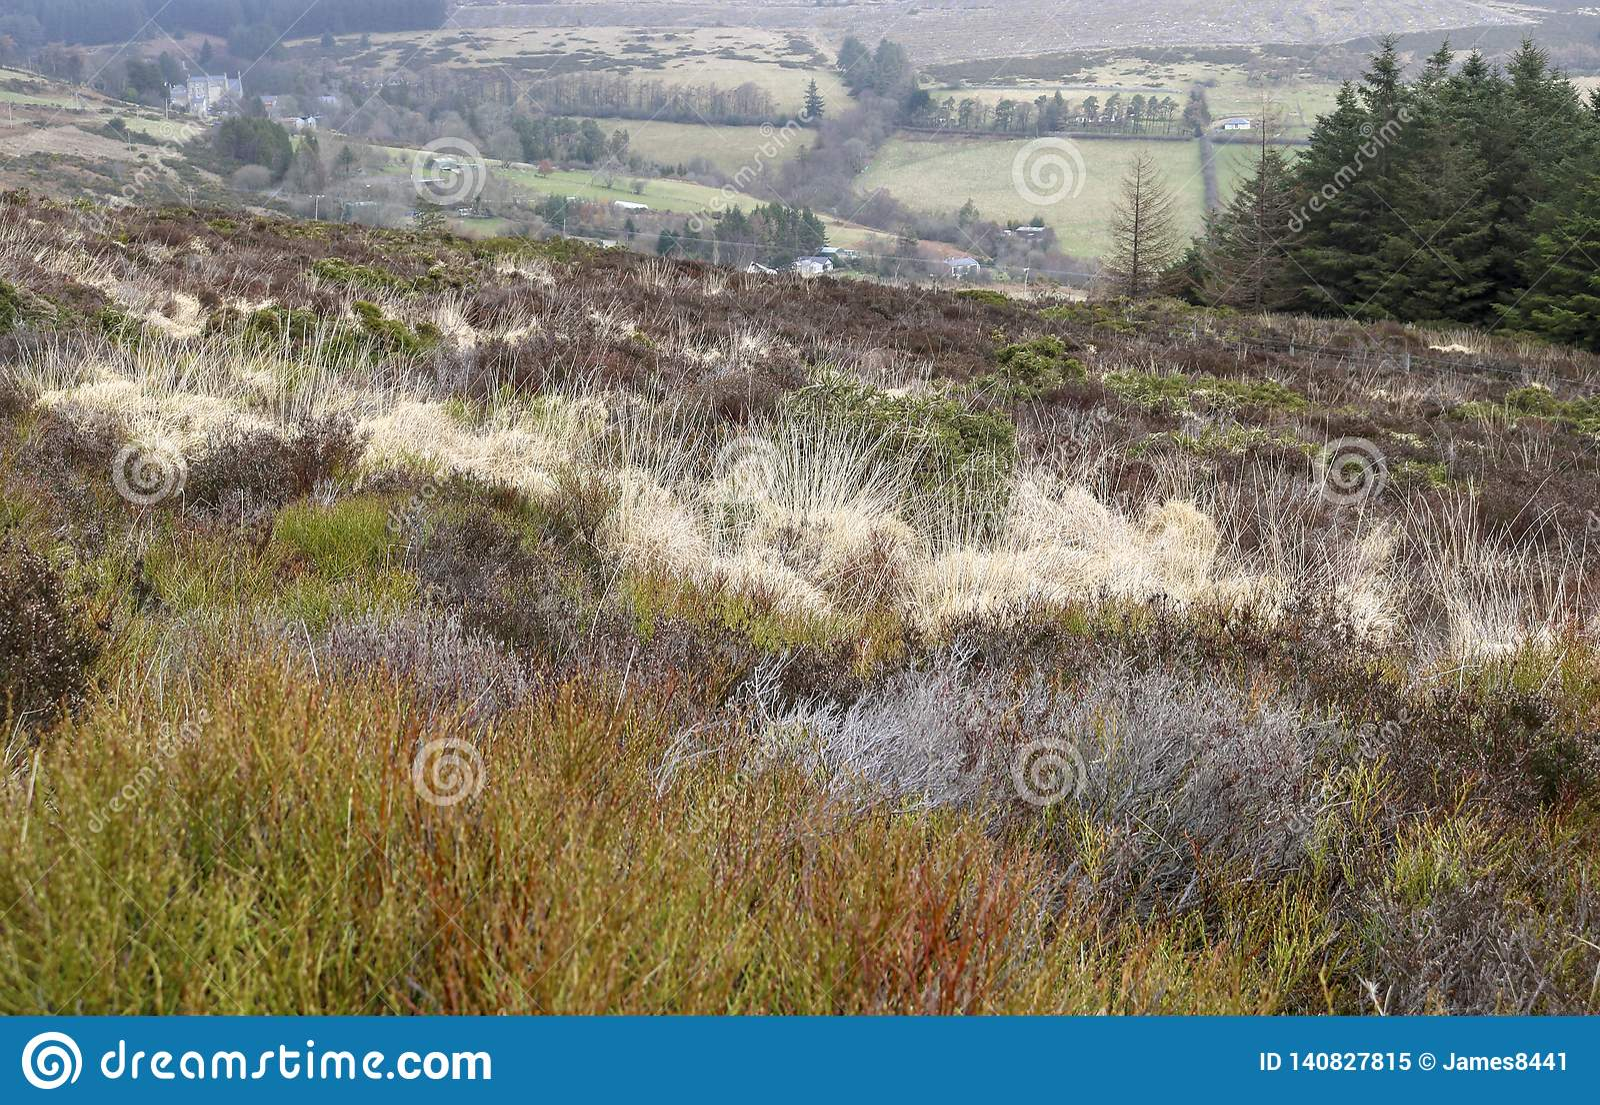 Flora van Ierland